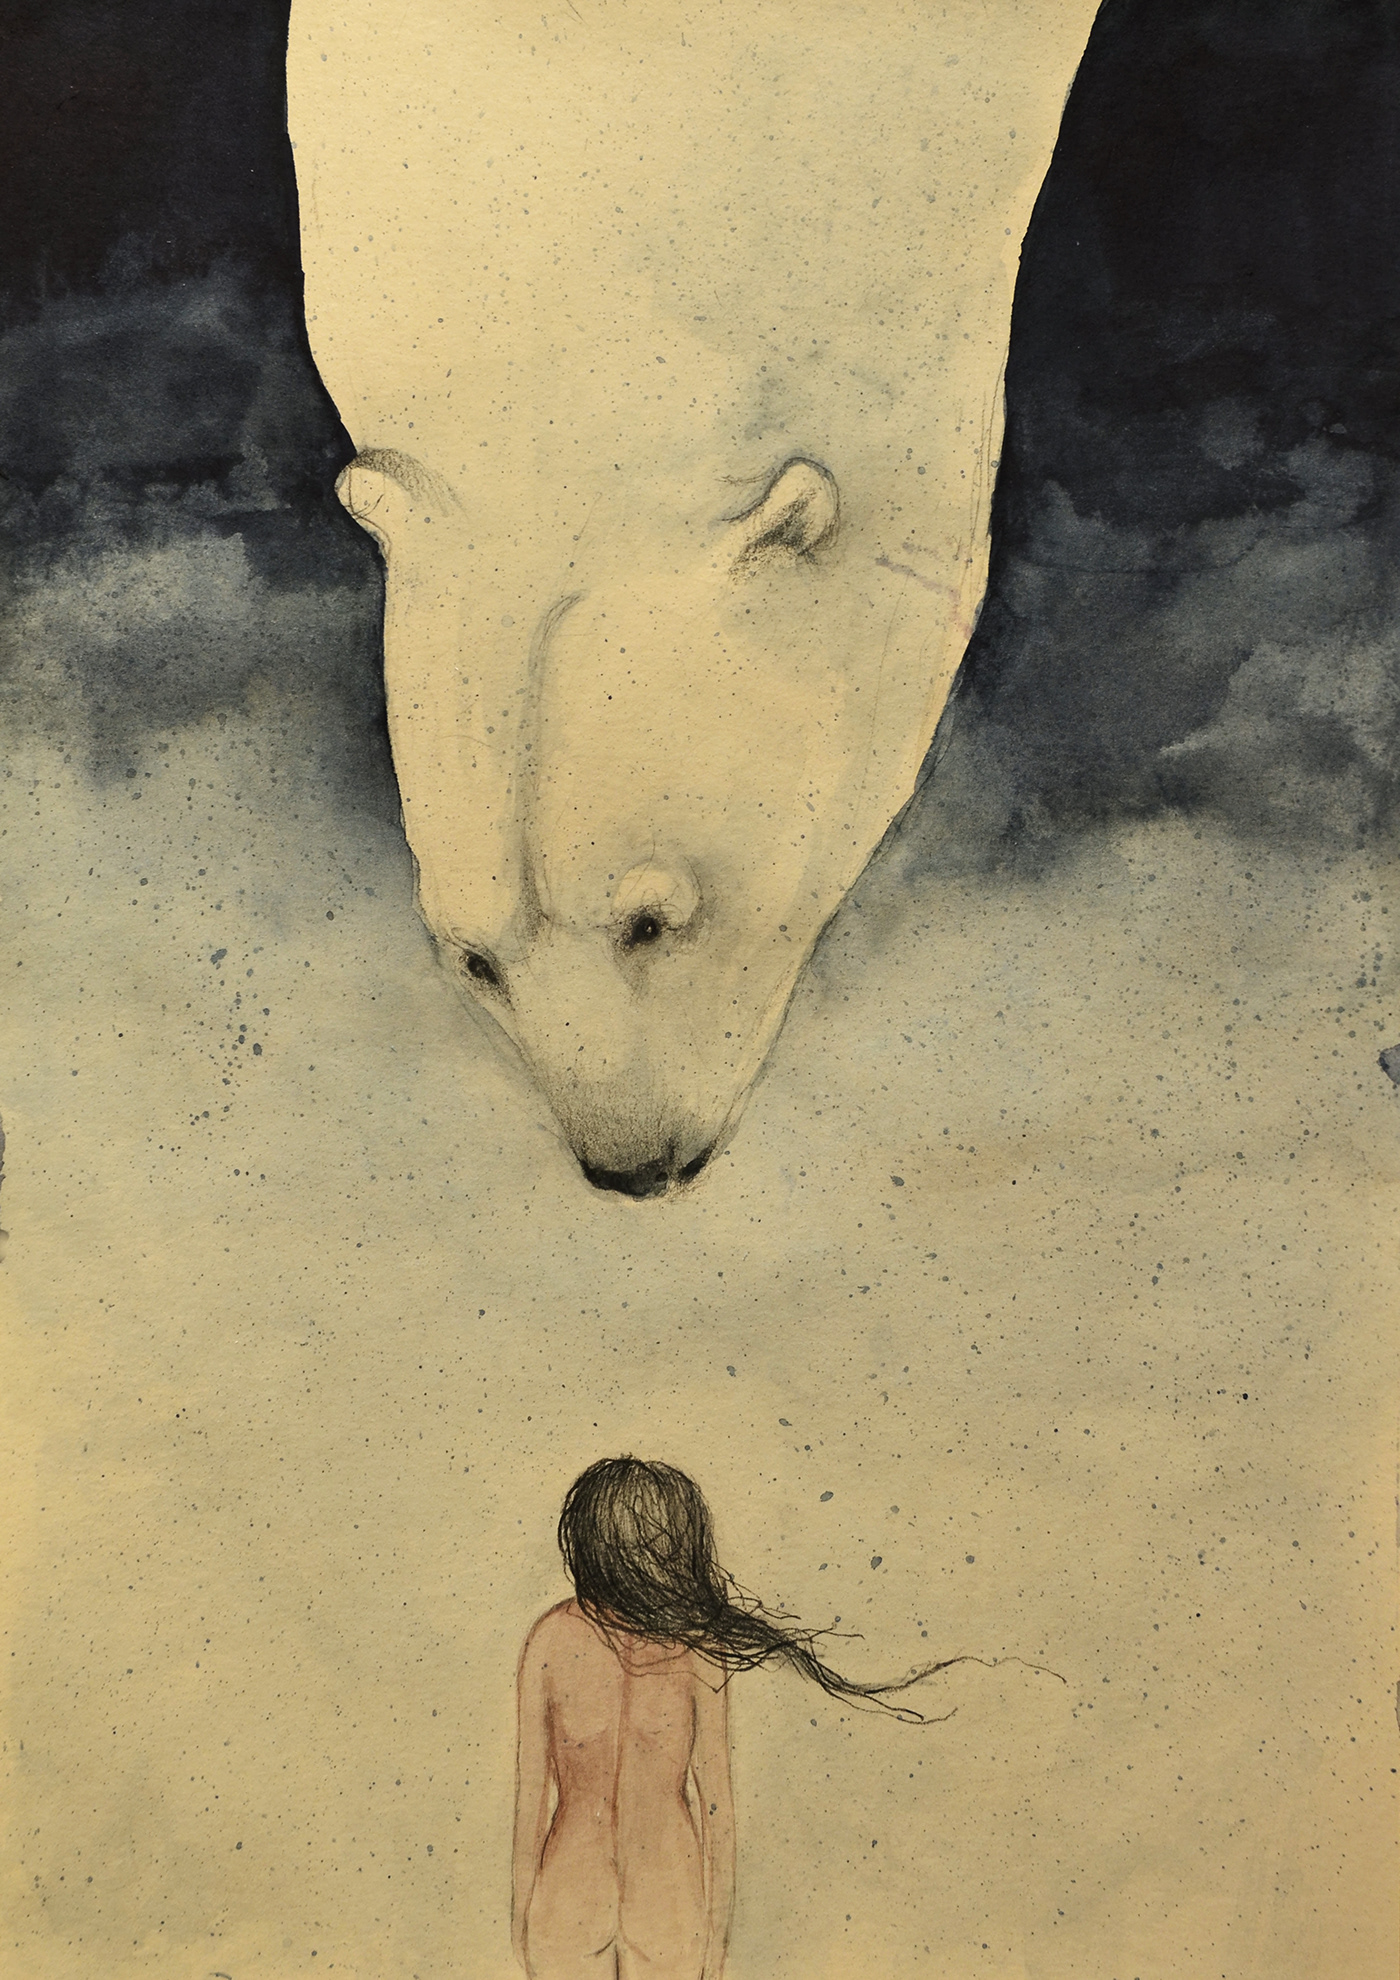 bear draw dream illustrations watercolor